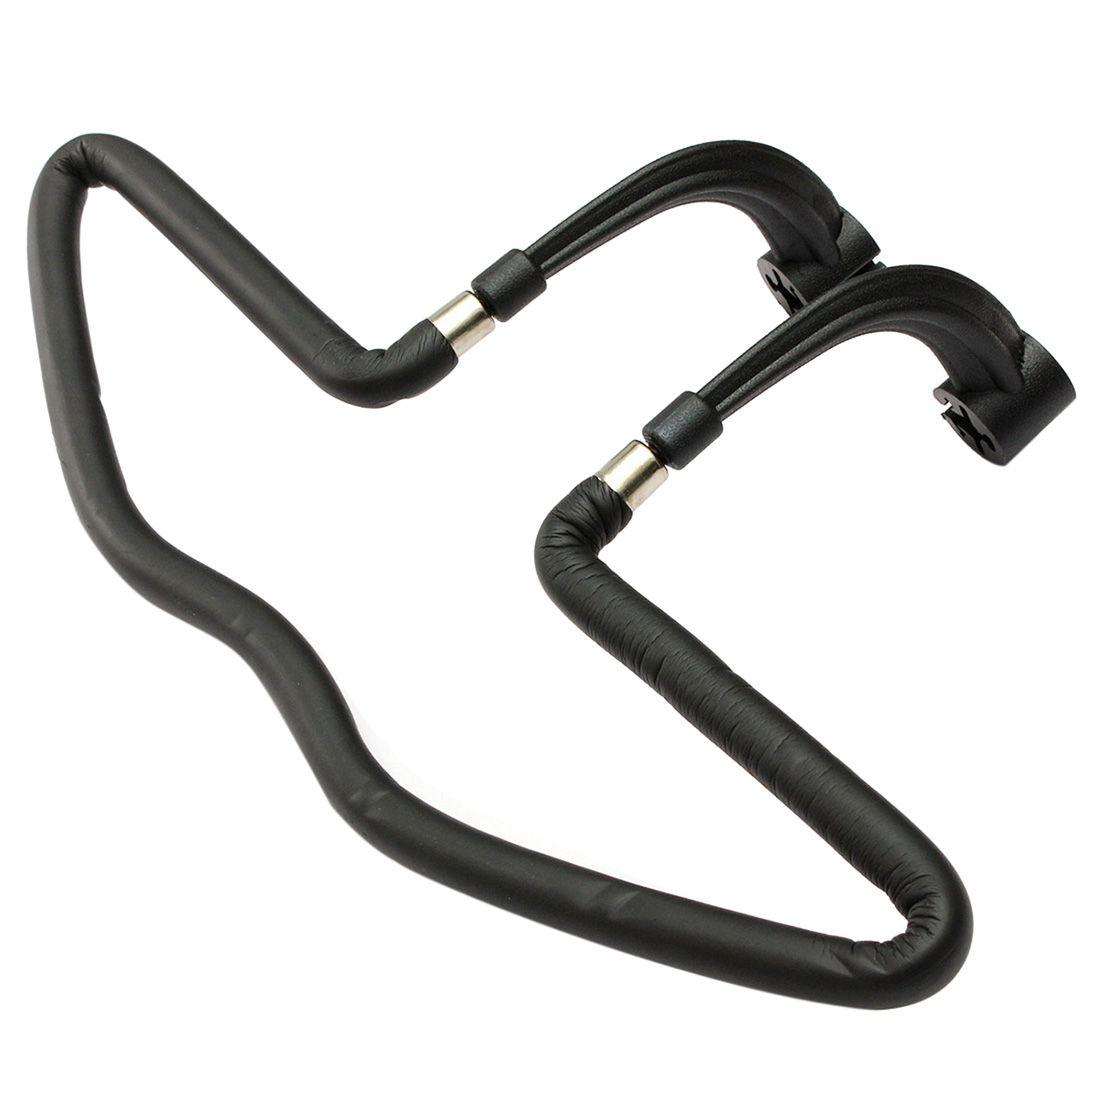 EDFY-Auto Car Interior hanger hangers headrests travel hanger Universal